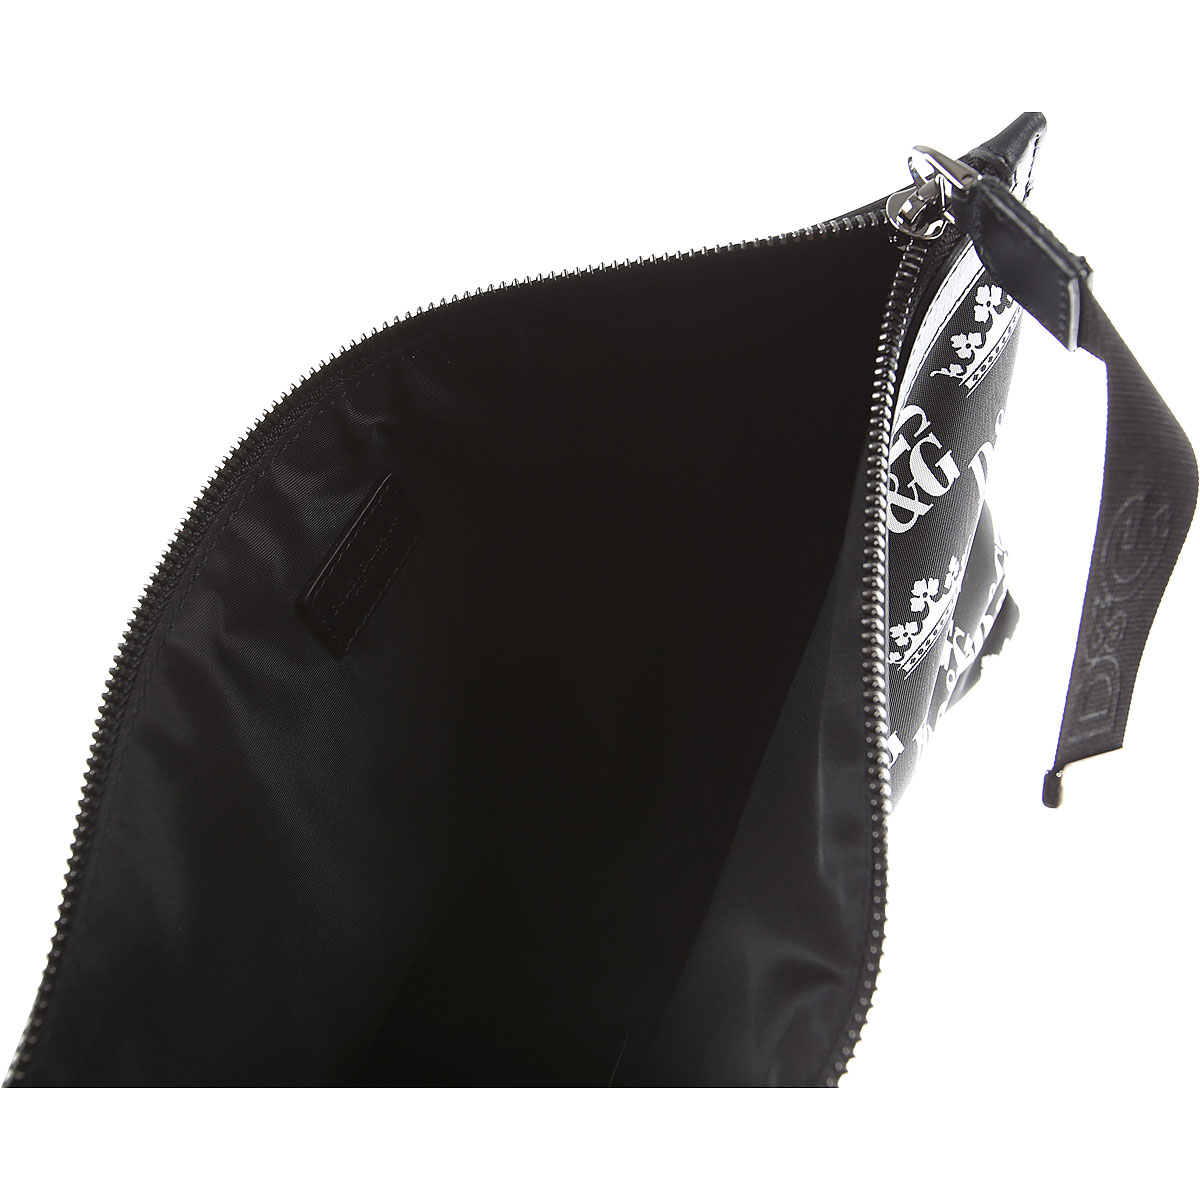 Gabbana Dolce 2019 Carteras Bolsos Primavera verano Negro amp; Blanco OUUqxf